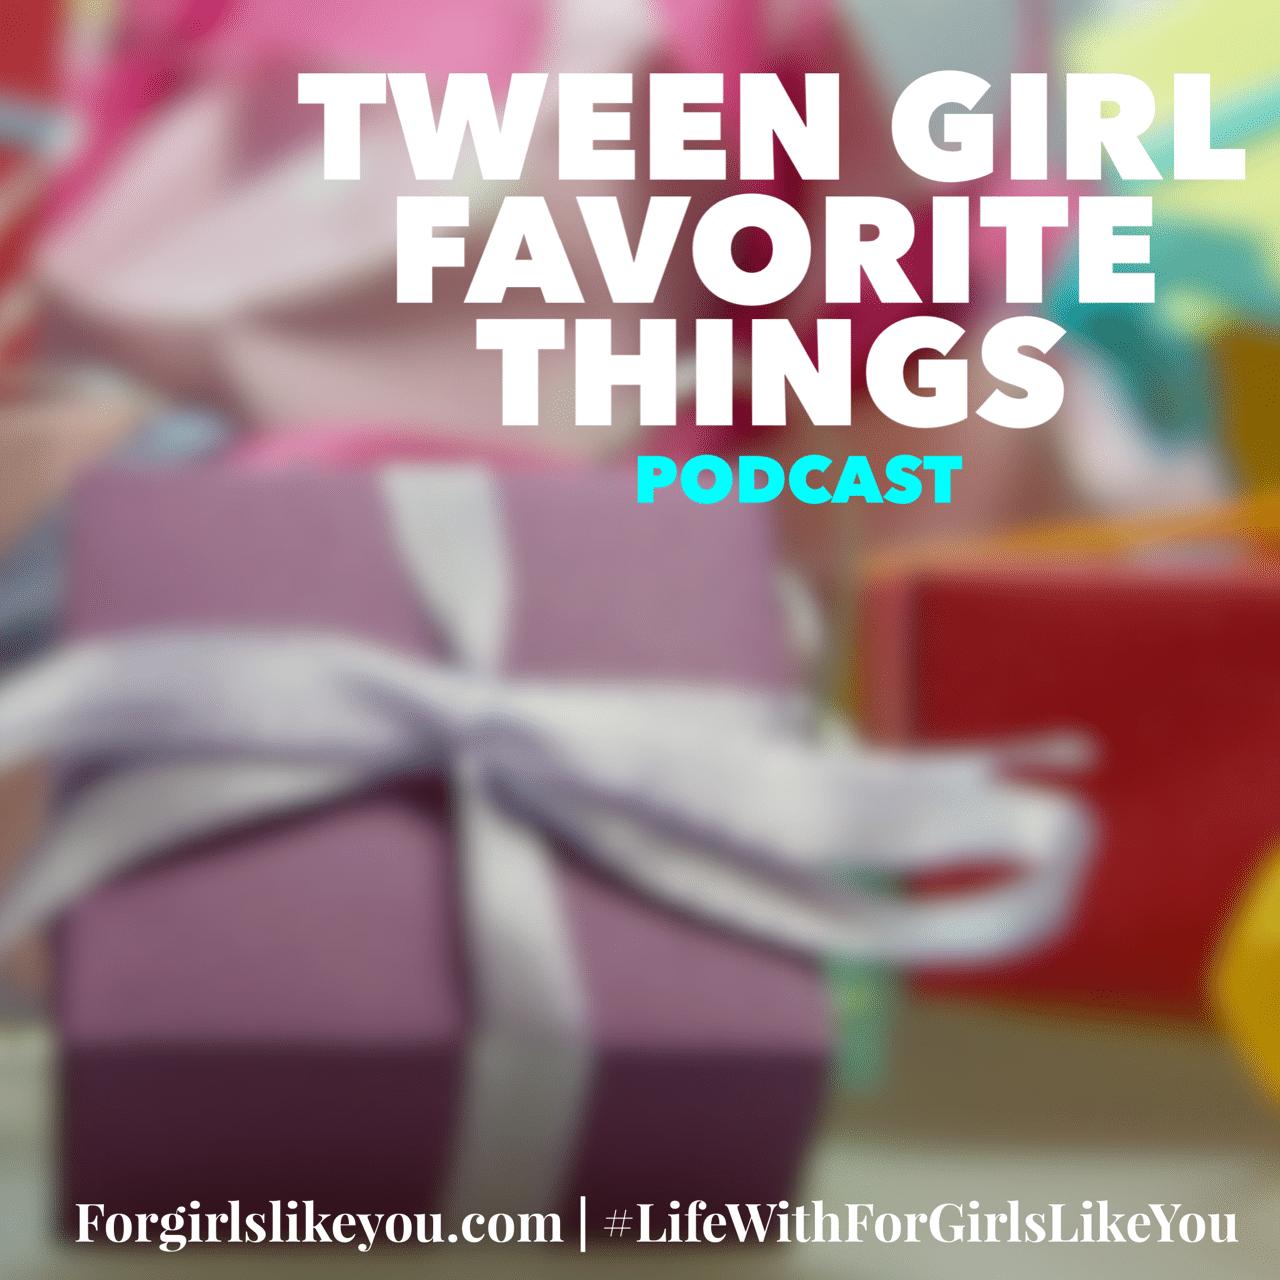 Girls Like You Mp3 Song Free Download: Tween Girl Favorite Things